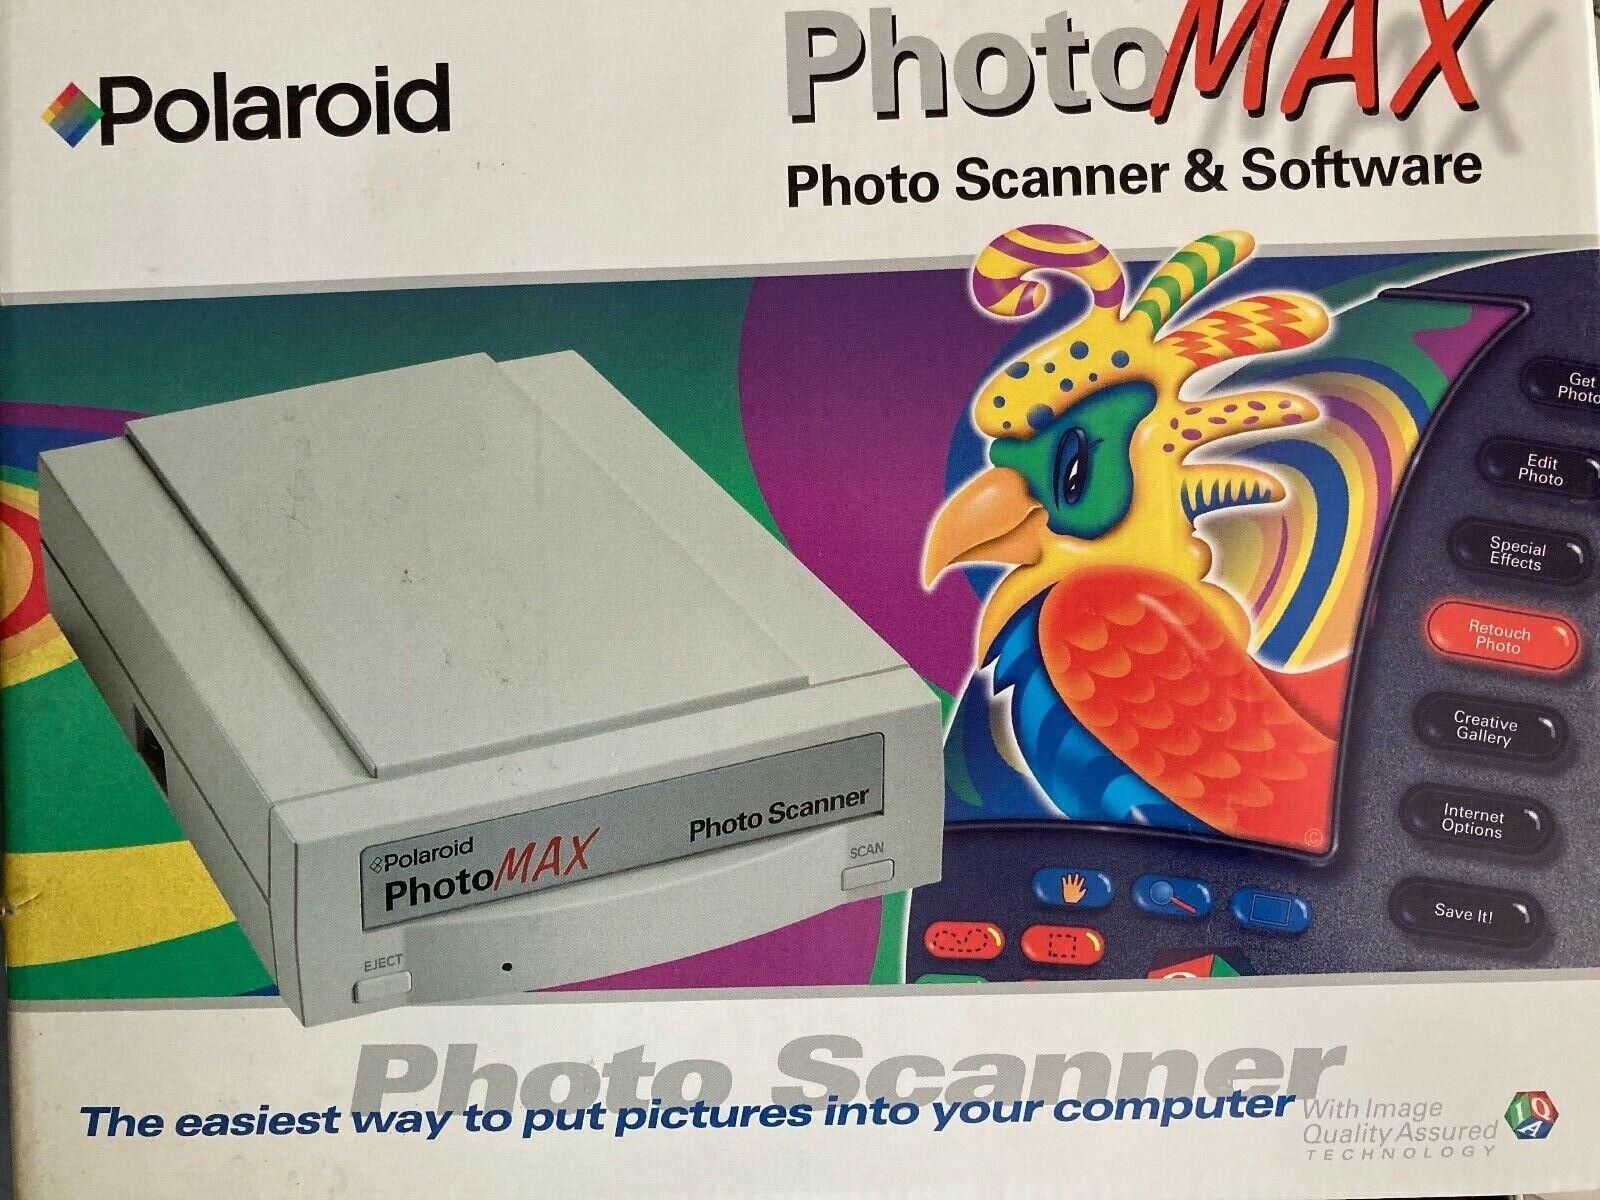 POLAROID PhotoMAX Photo Scanner & Software. 35mm Print 1200